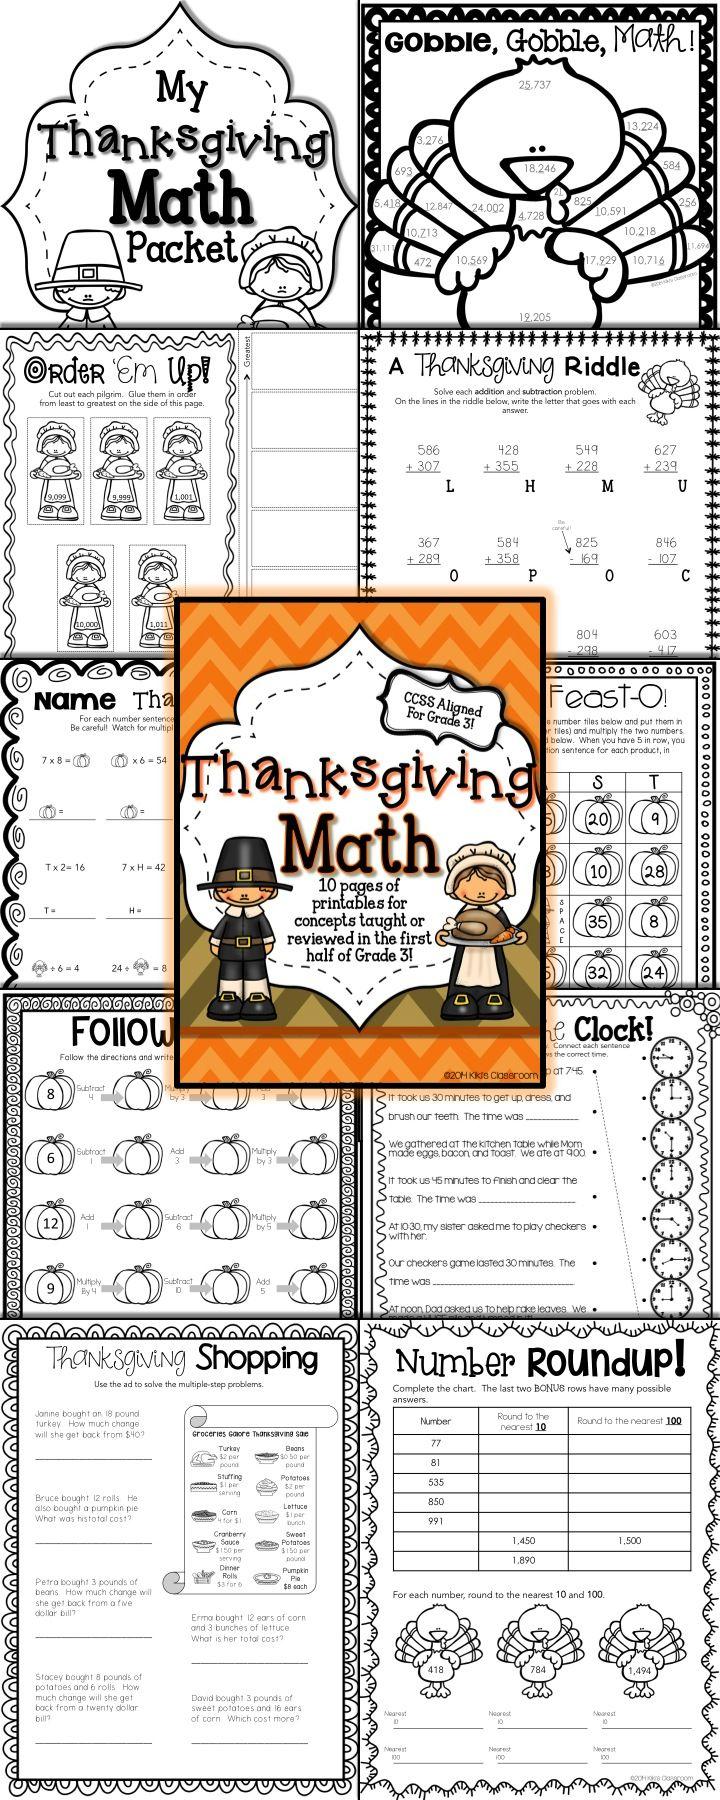 Thanksgiving Math Activities And 3rd Grade Multiplication Worksheets Thanksgiving Math Thanksgiving Math Activities Third Grade Math Stations [ 1800 x 720 Pixel ]